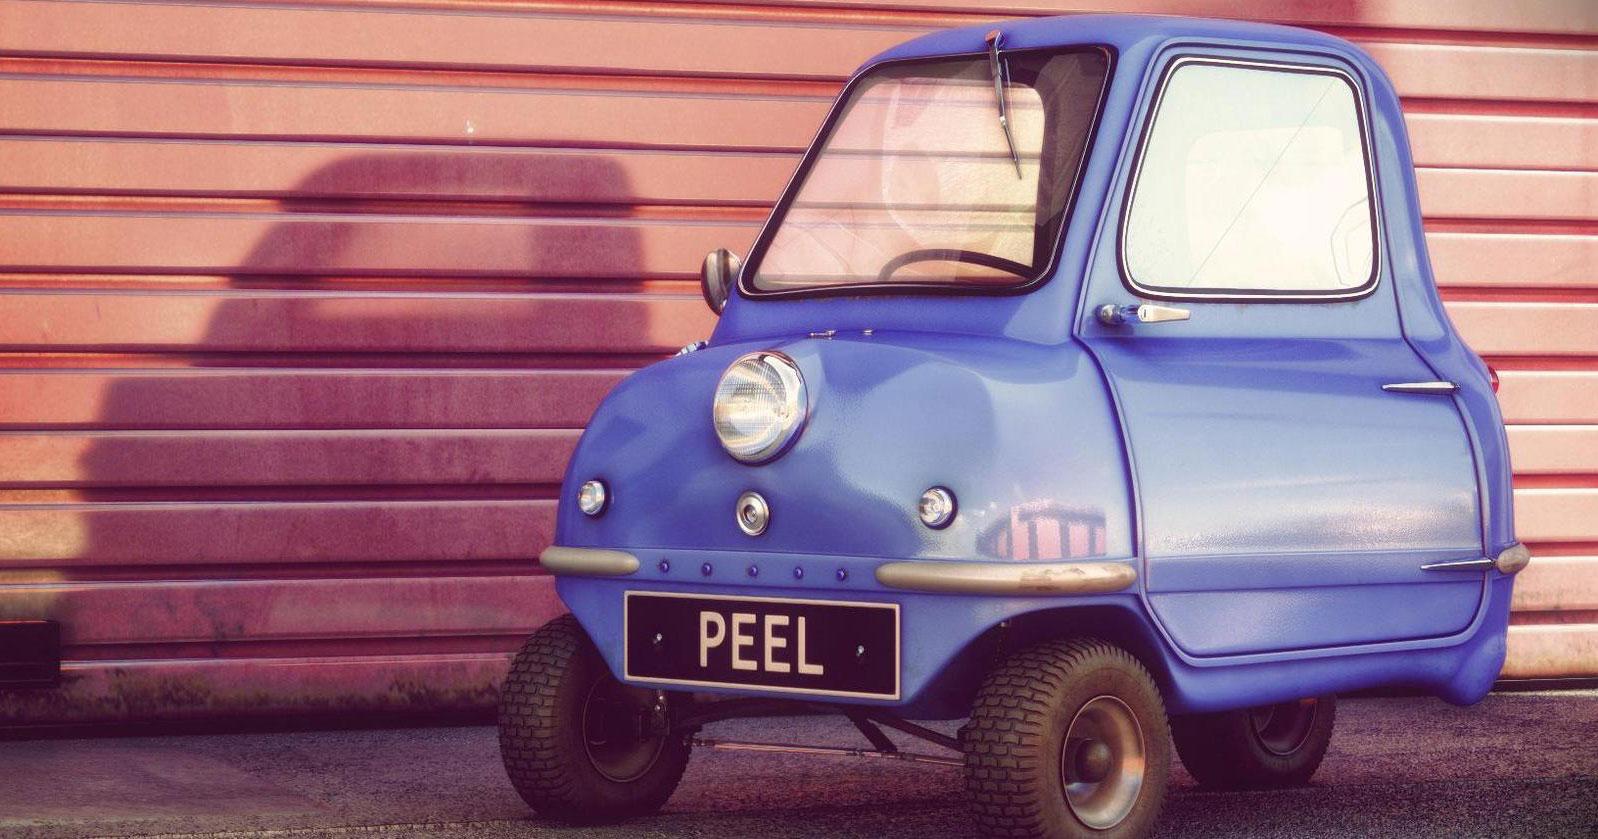 worlds-smallest-car-peel-p50-(8)